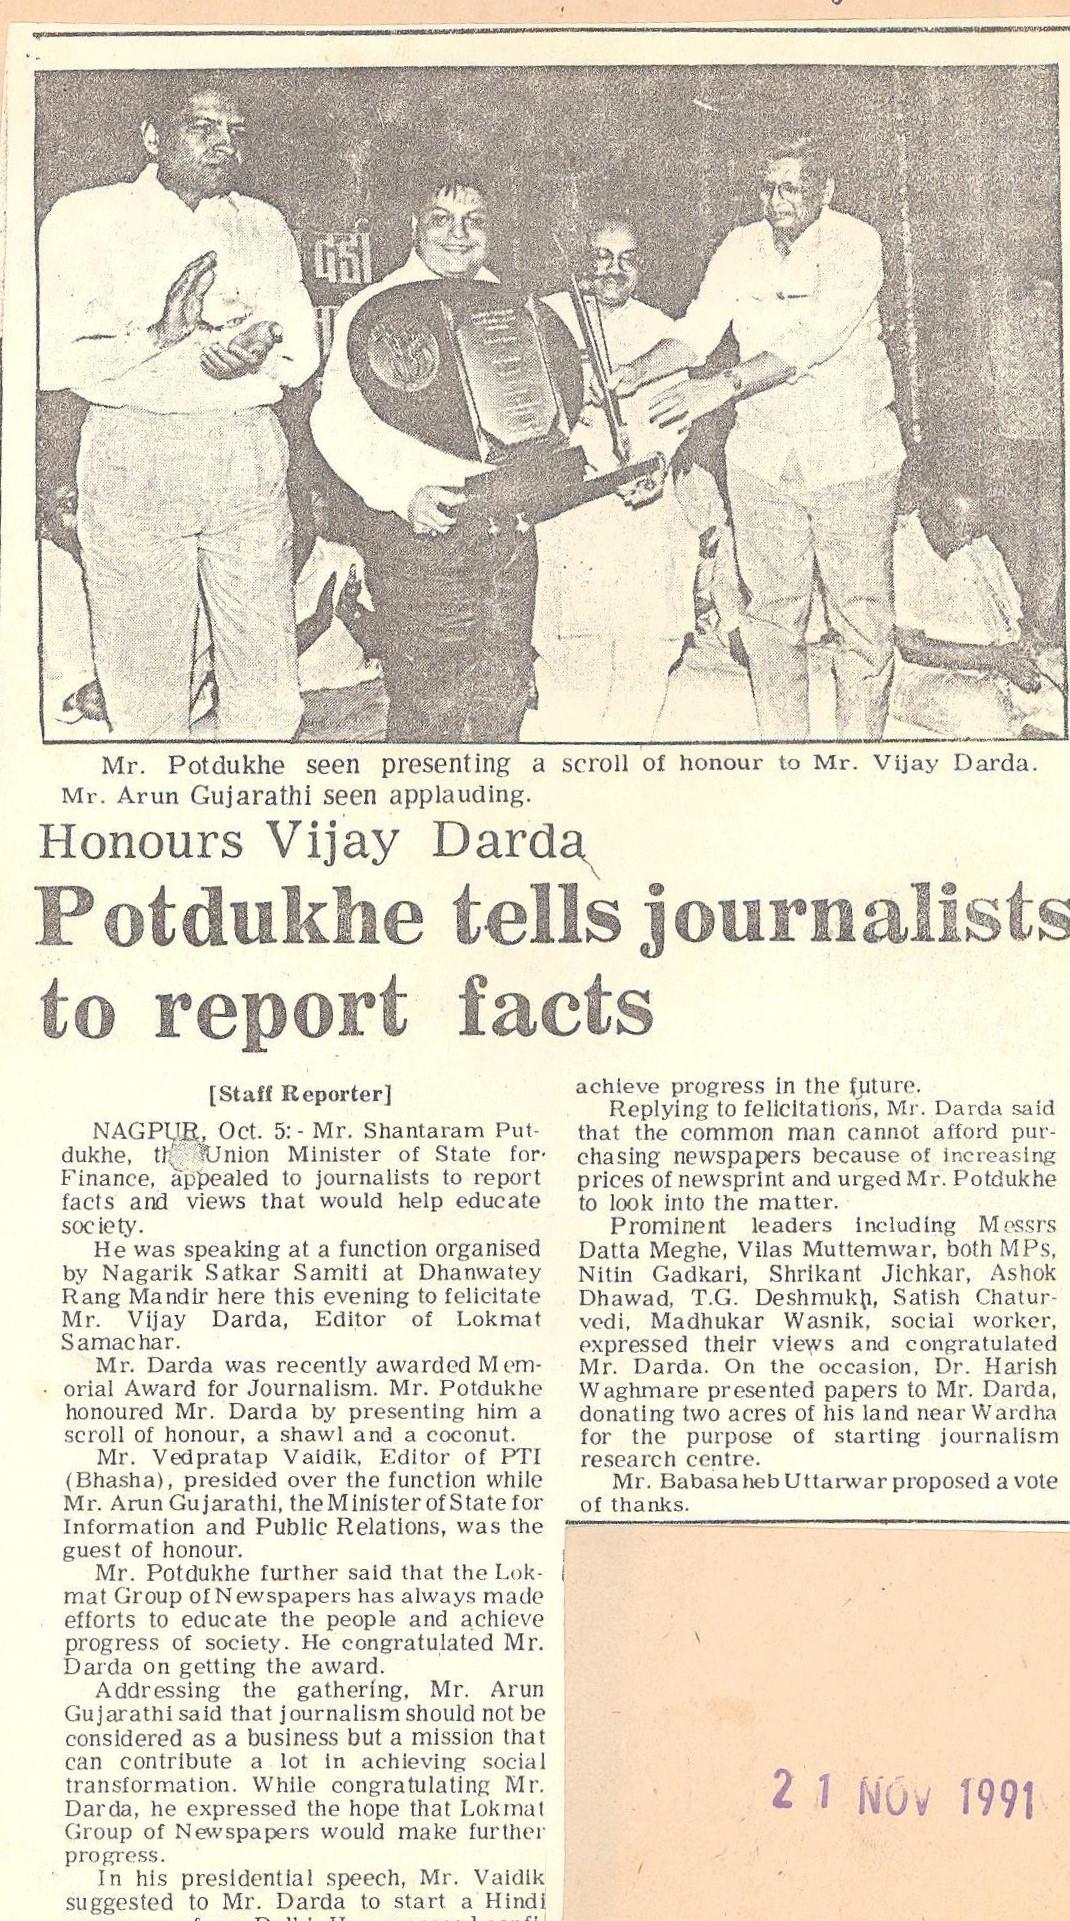 Potdukhe tells journalists to report facts